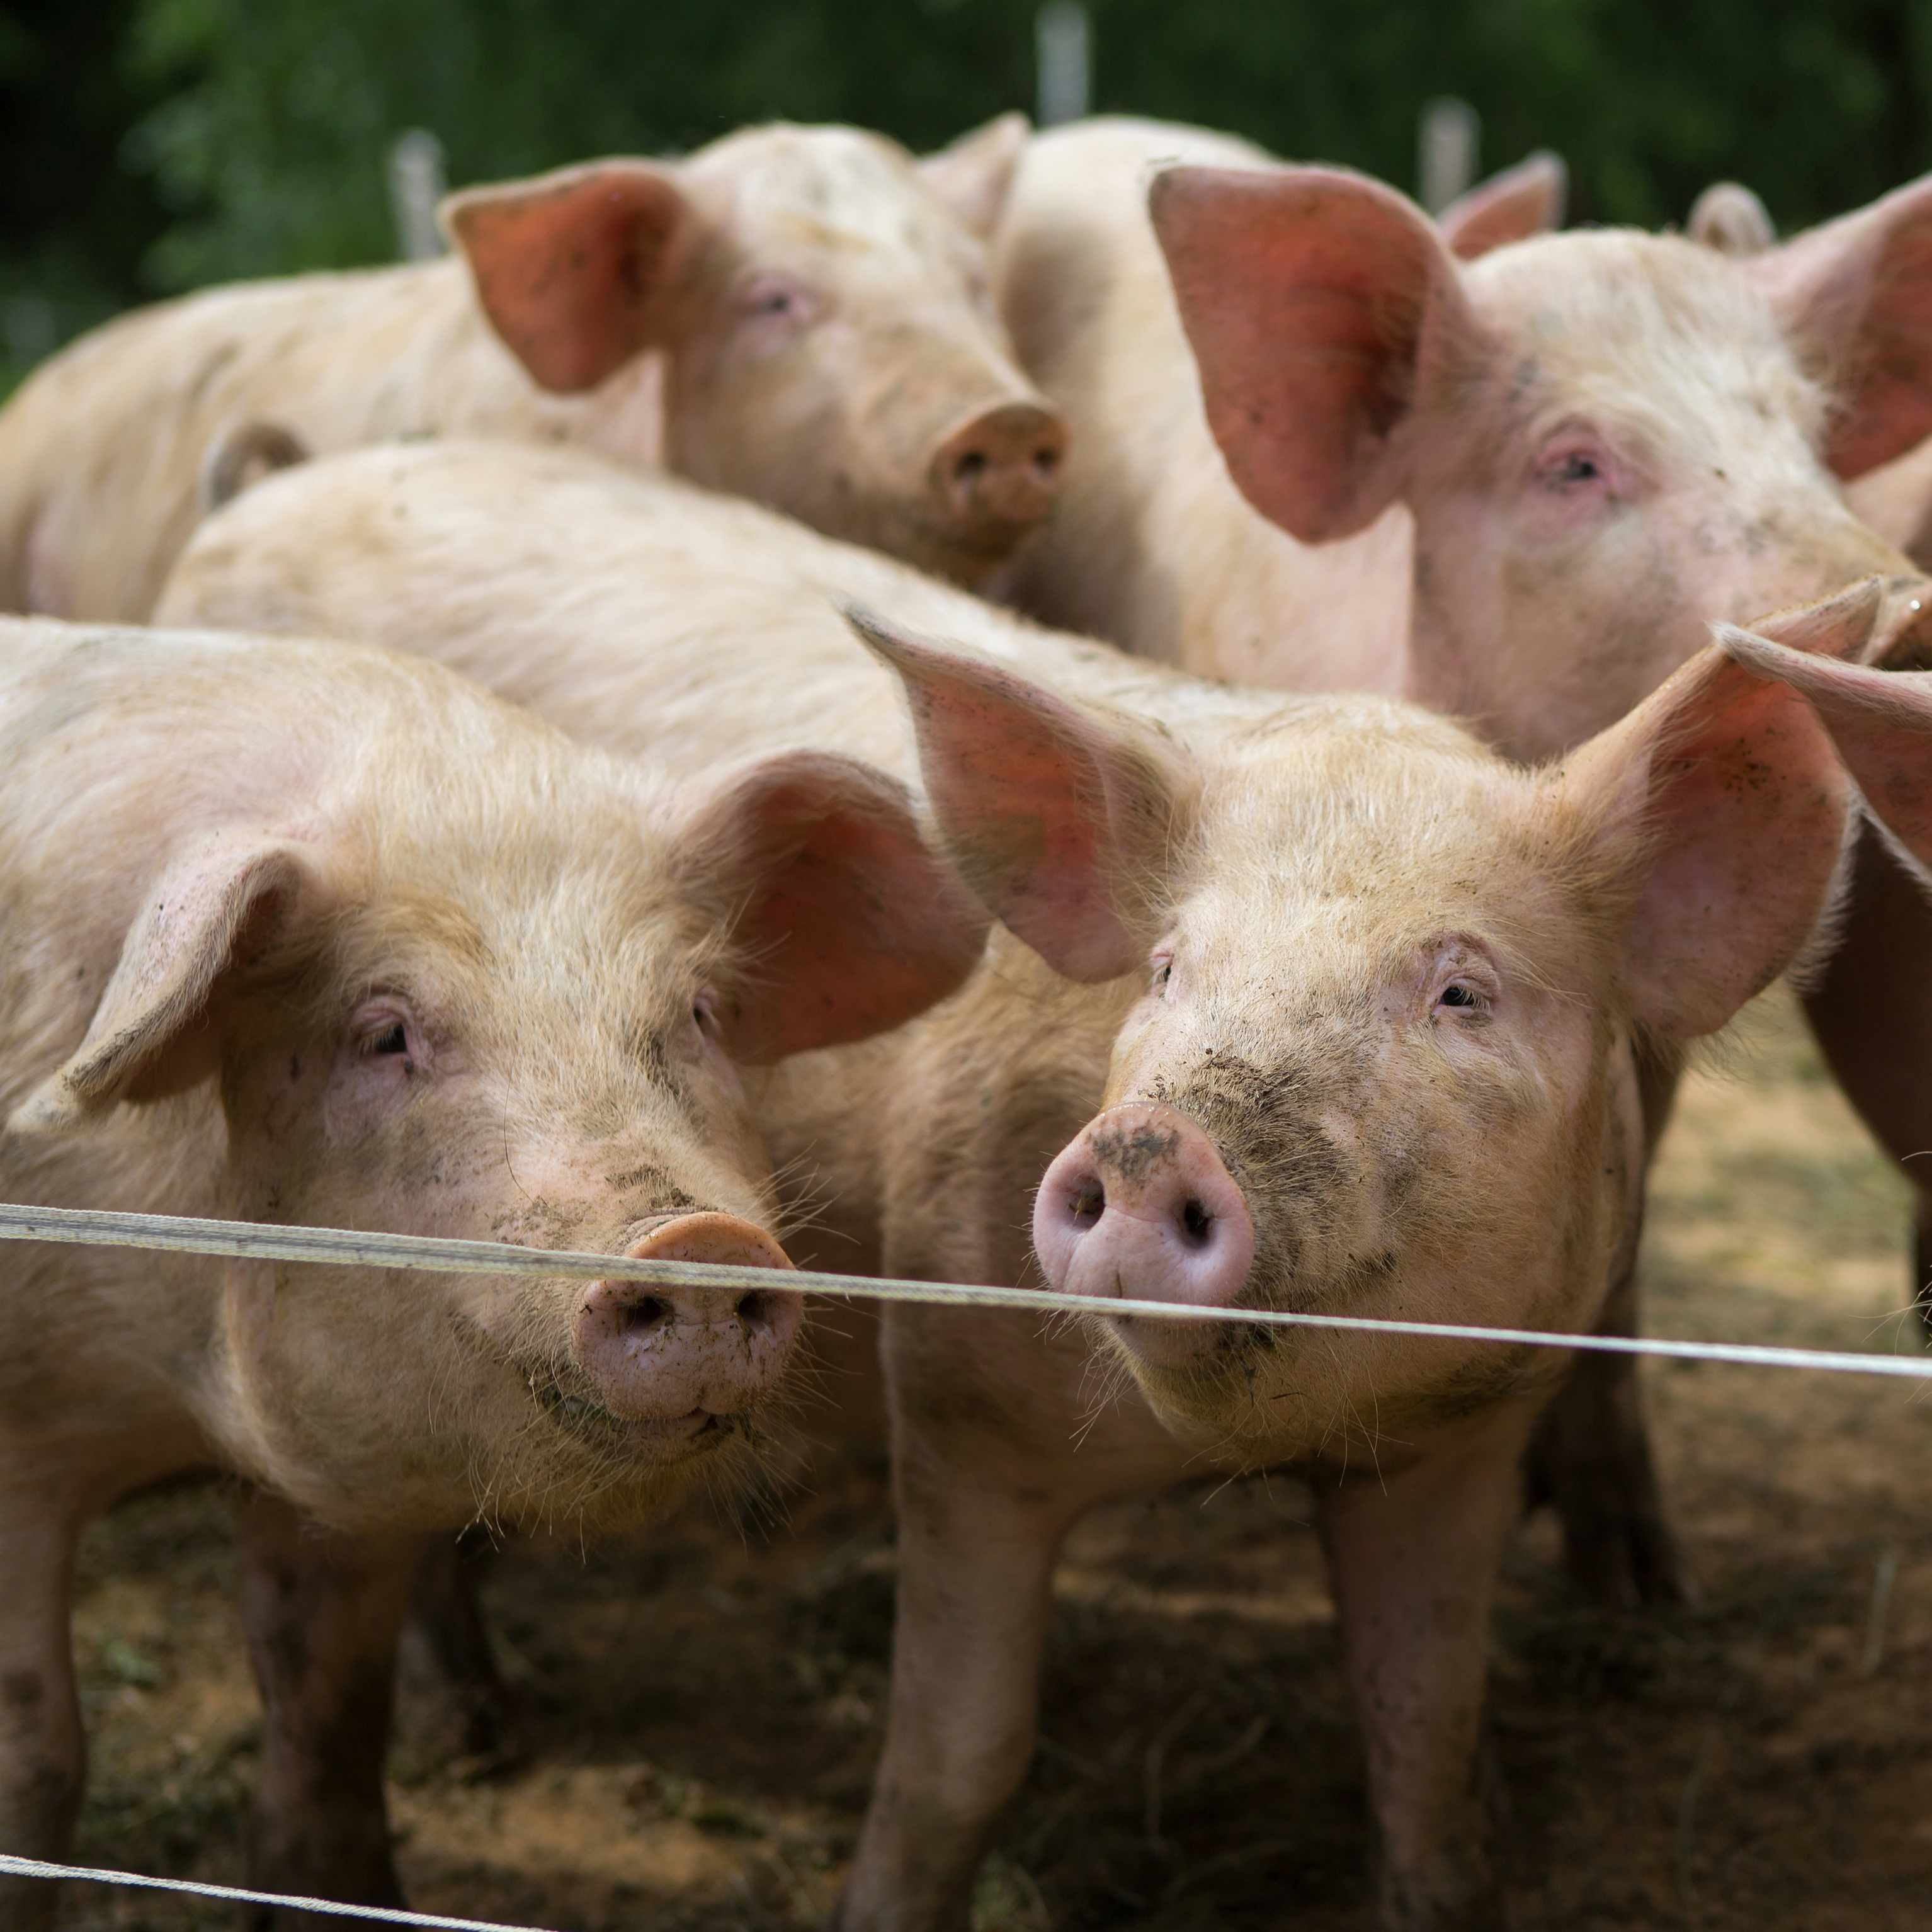 a hog pen full of pigs or swine on a farm